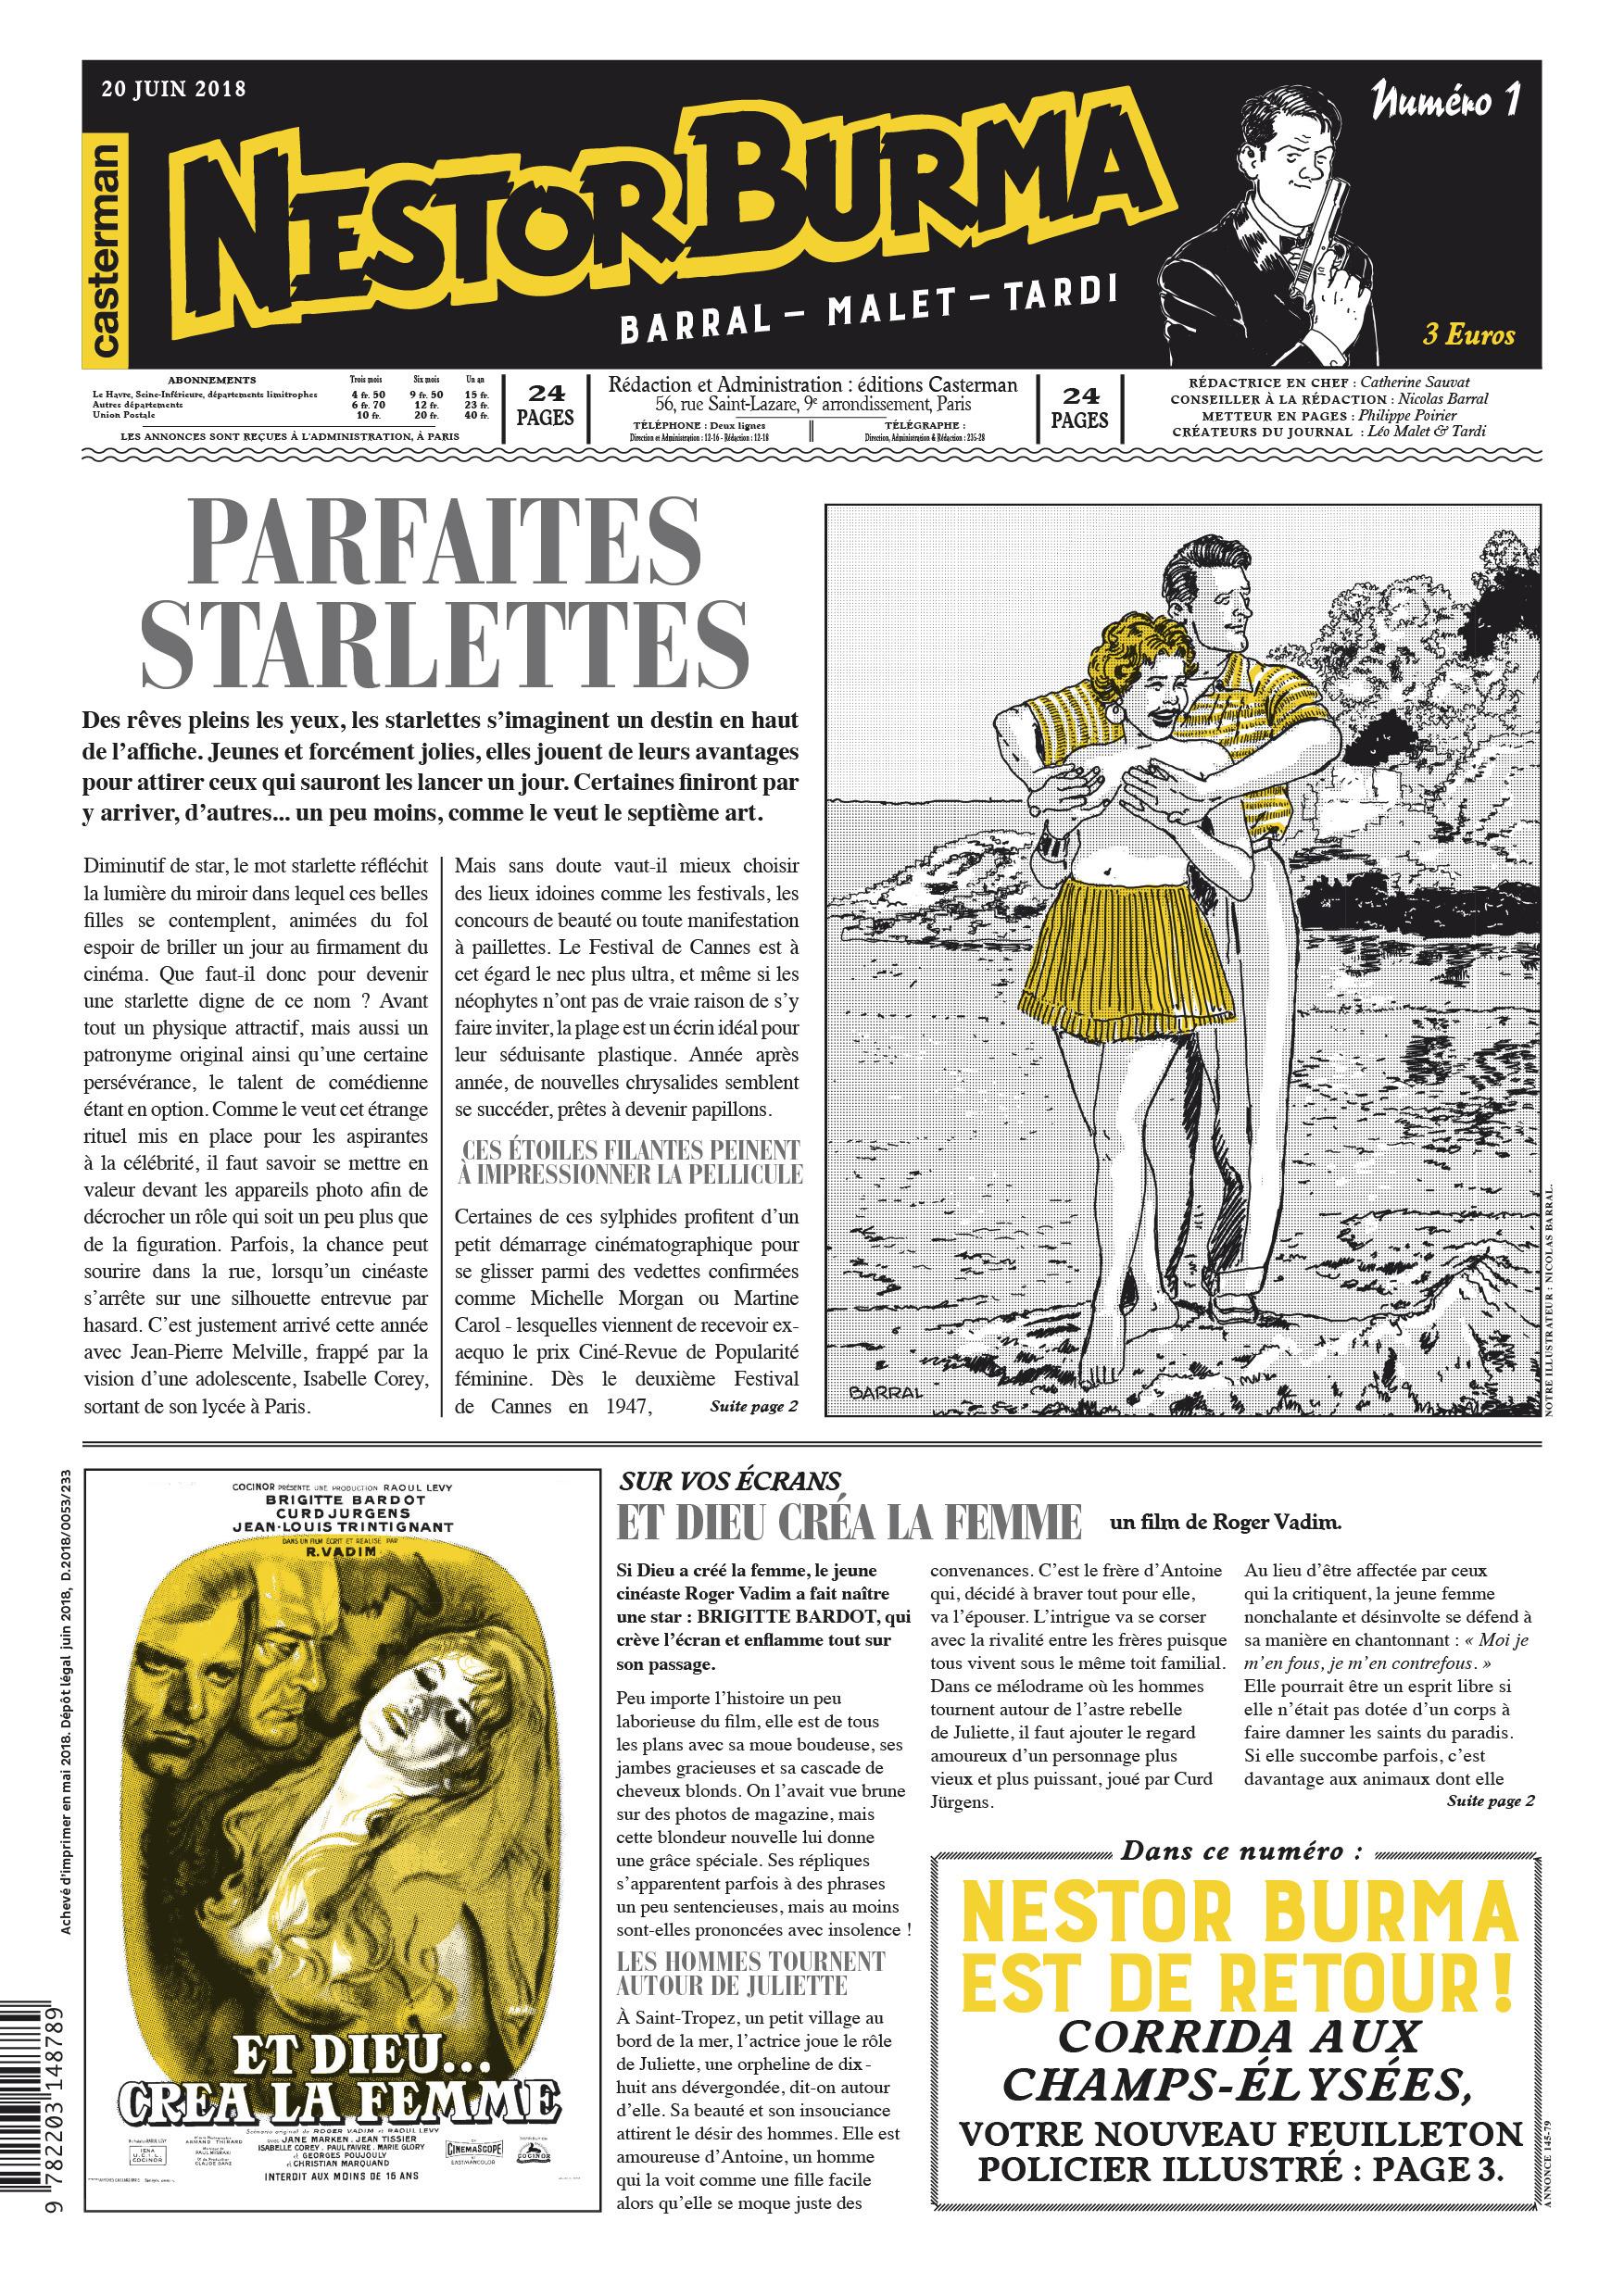 NESTOR BURMA CORRIDA AUX CHAMPS ELYSEES-JOURNAL 1